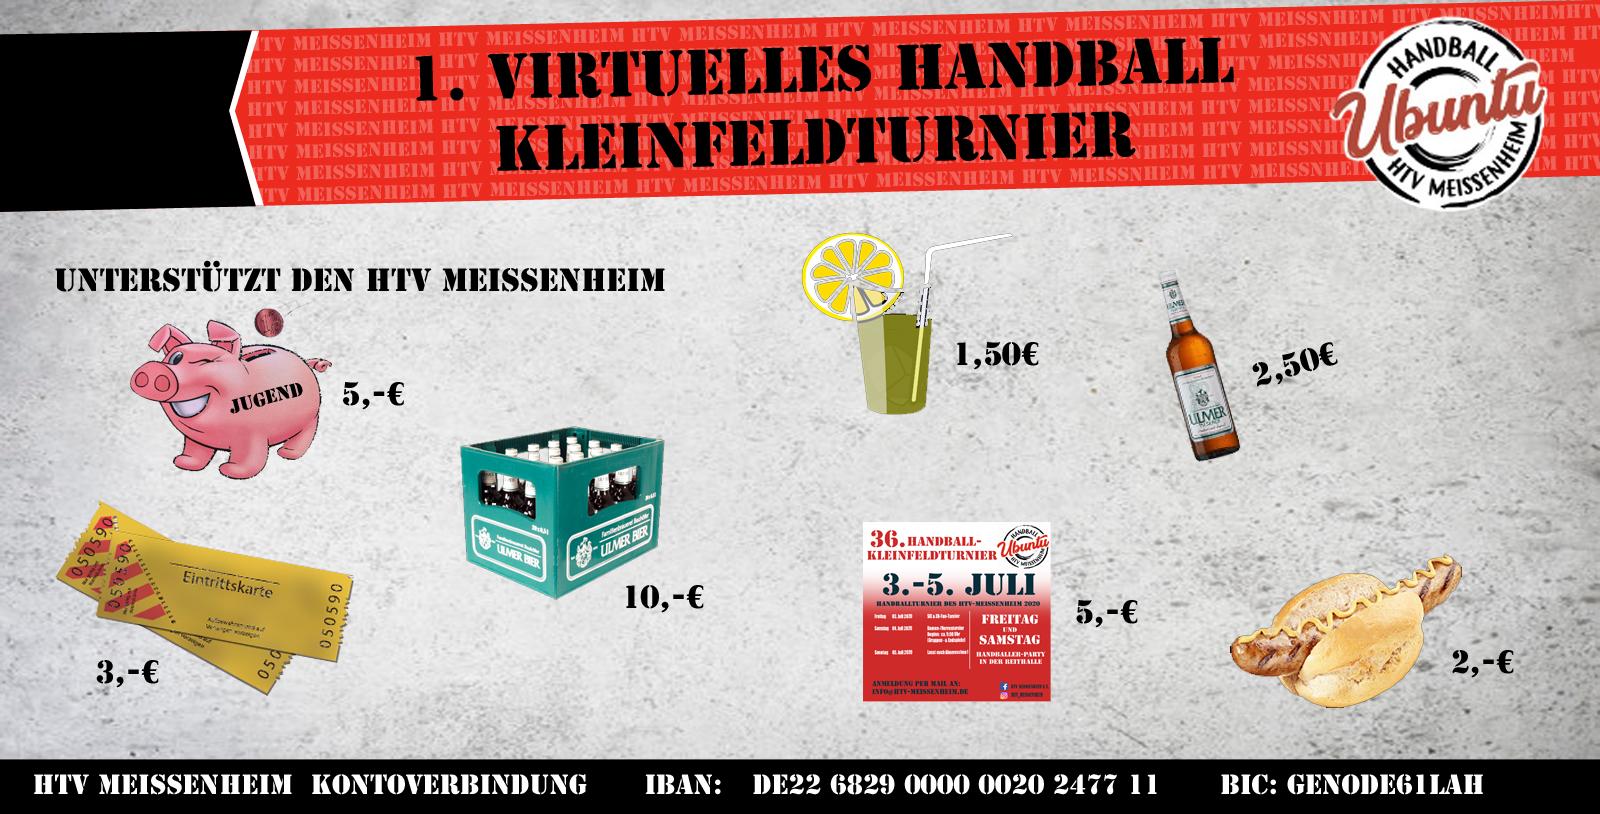 1. virtuelles Handball-Kleinfeldturnier